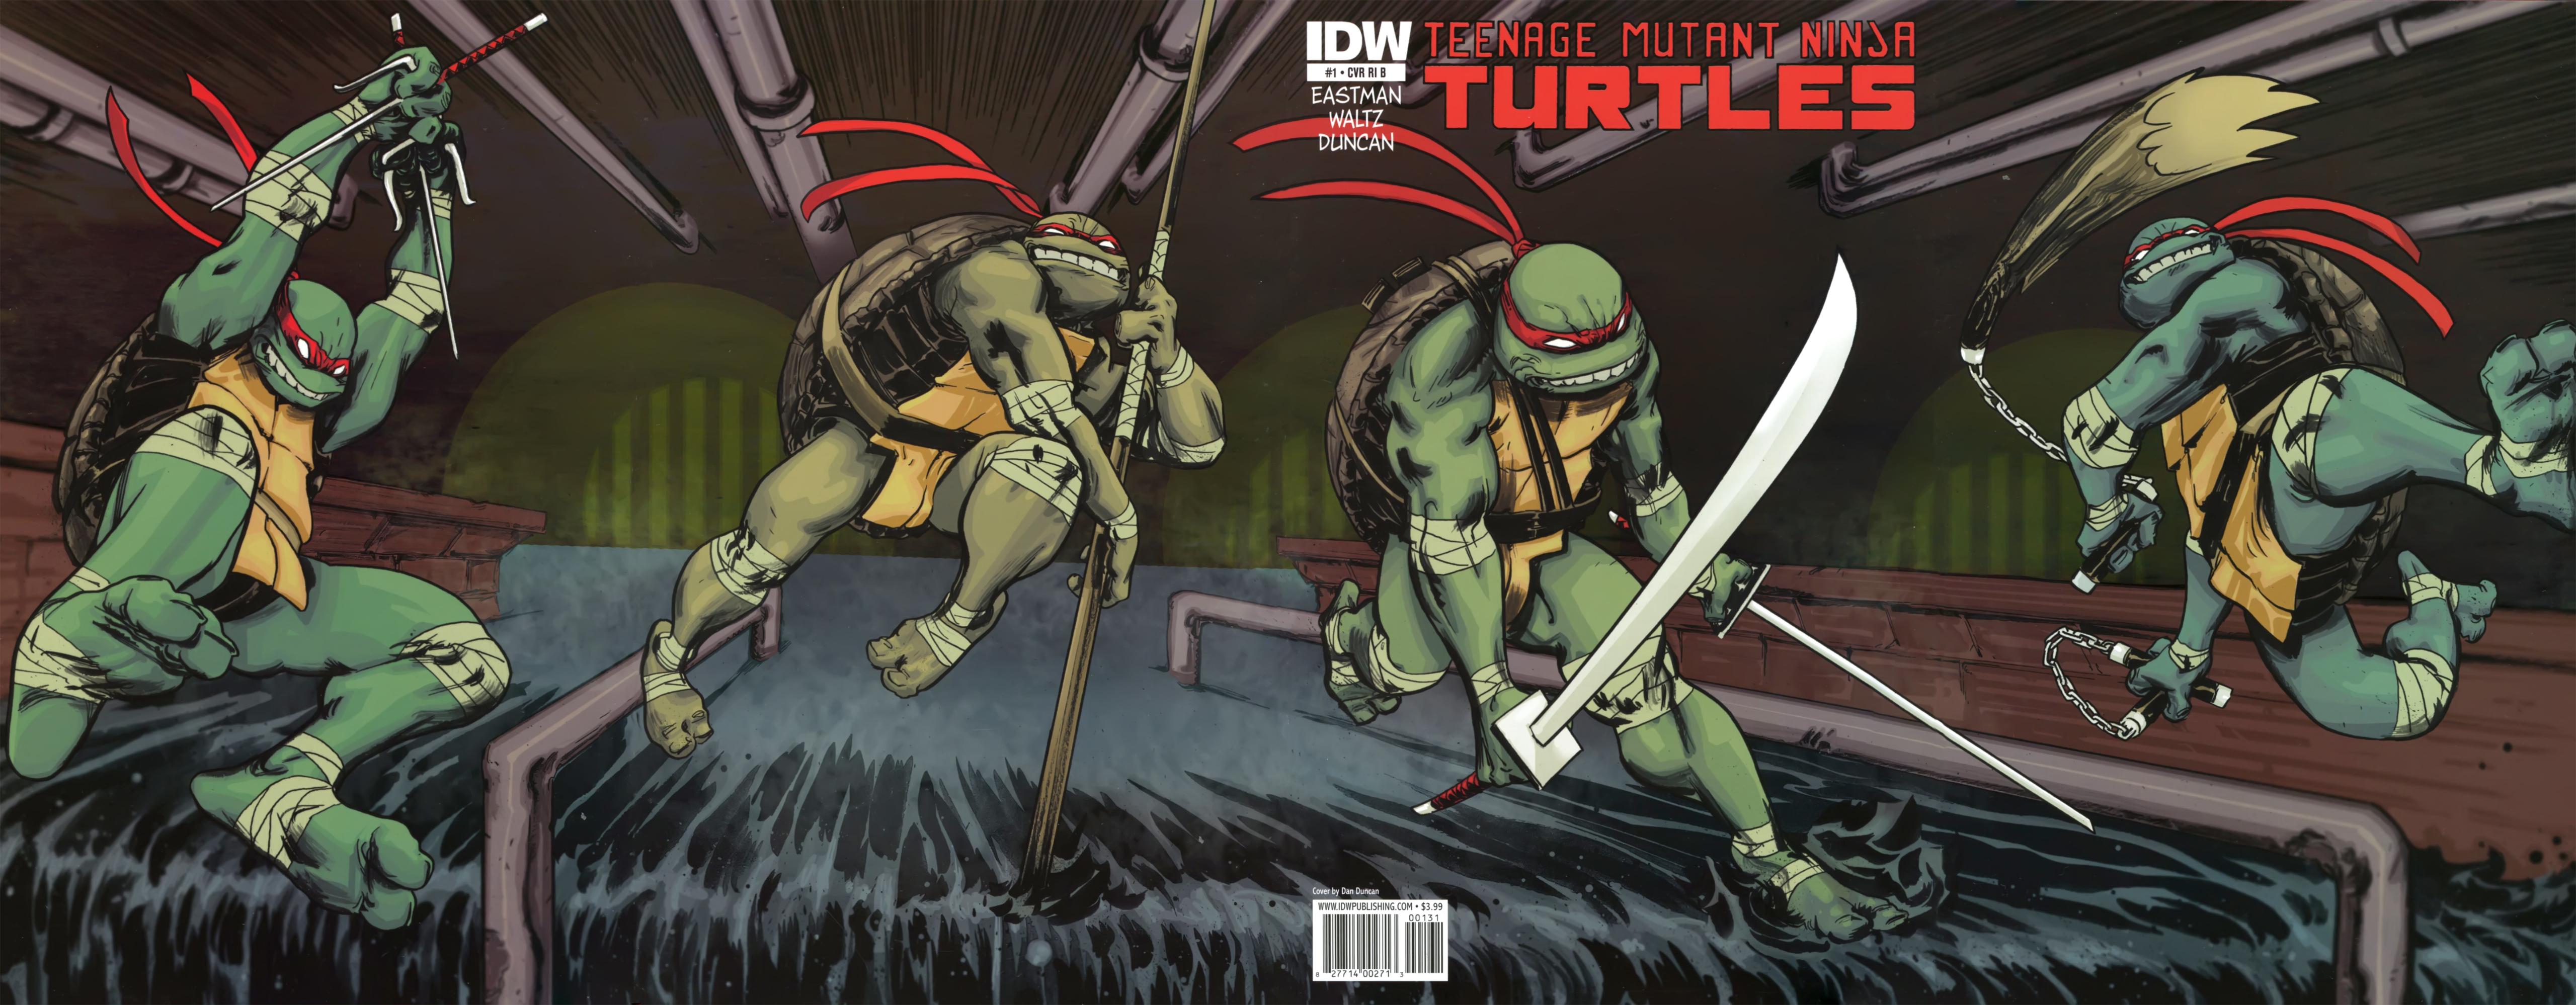 TMNT 1 Oroboros CPS 006 009 Comic Review: TMNT Vol.1: Change is Constant